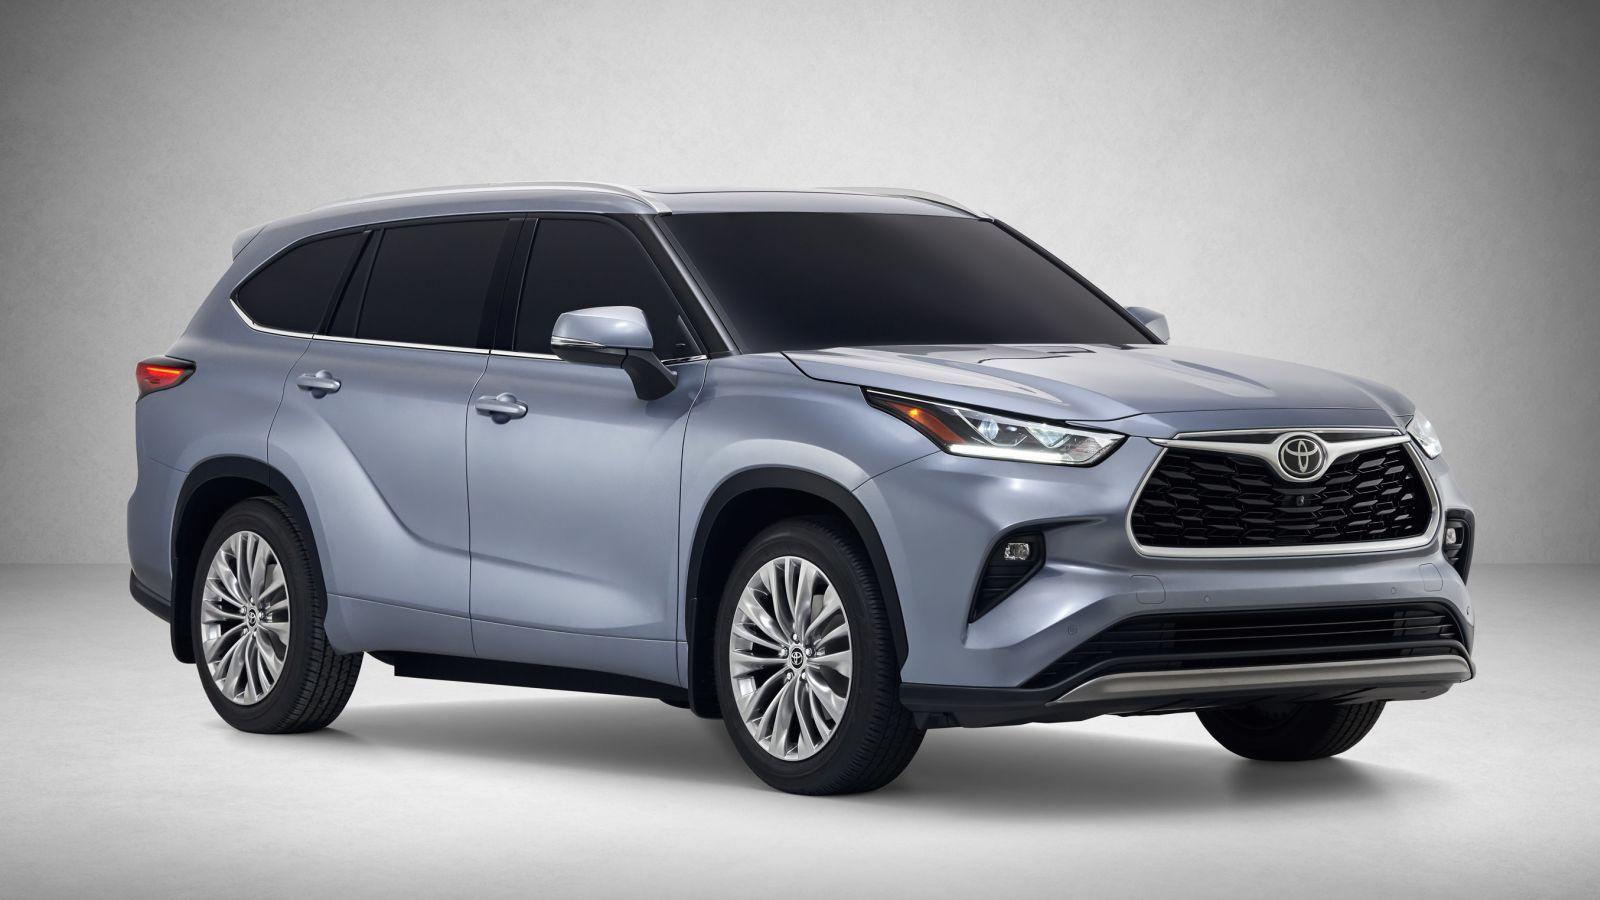 The 2020 Toyota Highlander Hybrid Gets 34 Mpg And A Big New